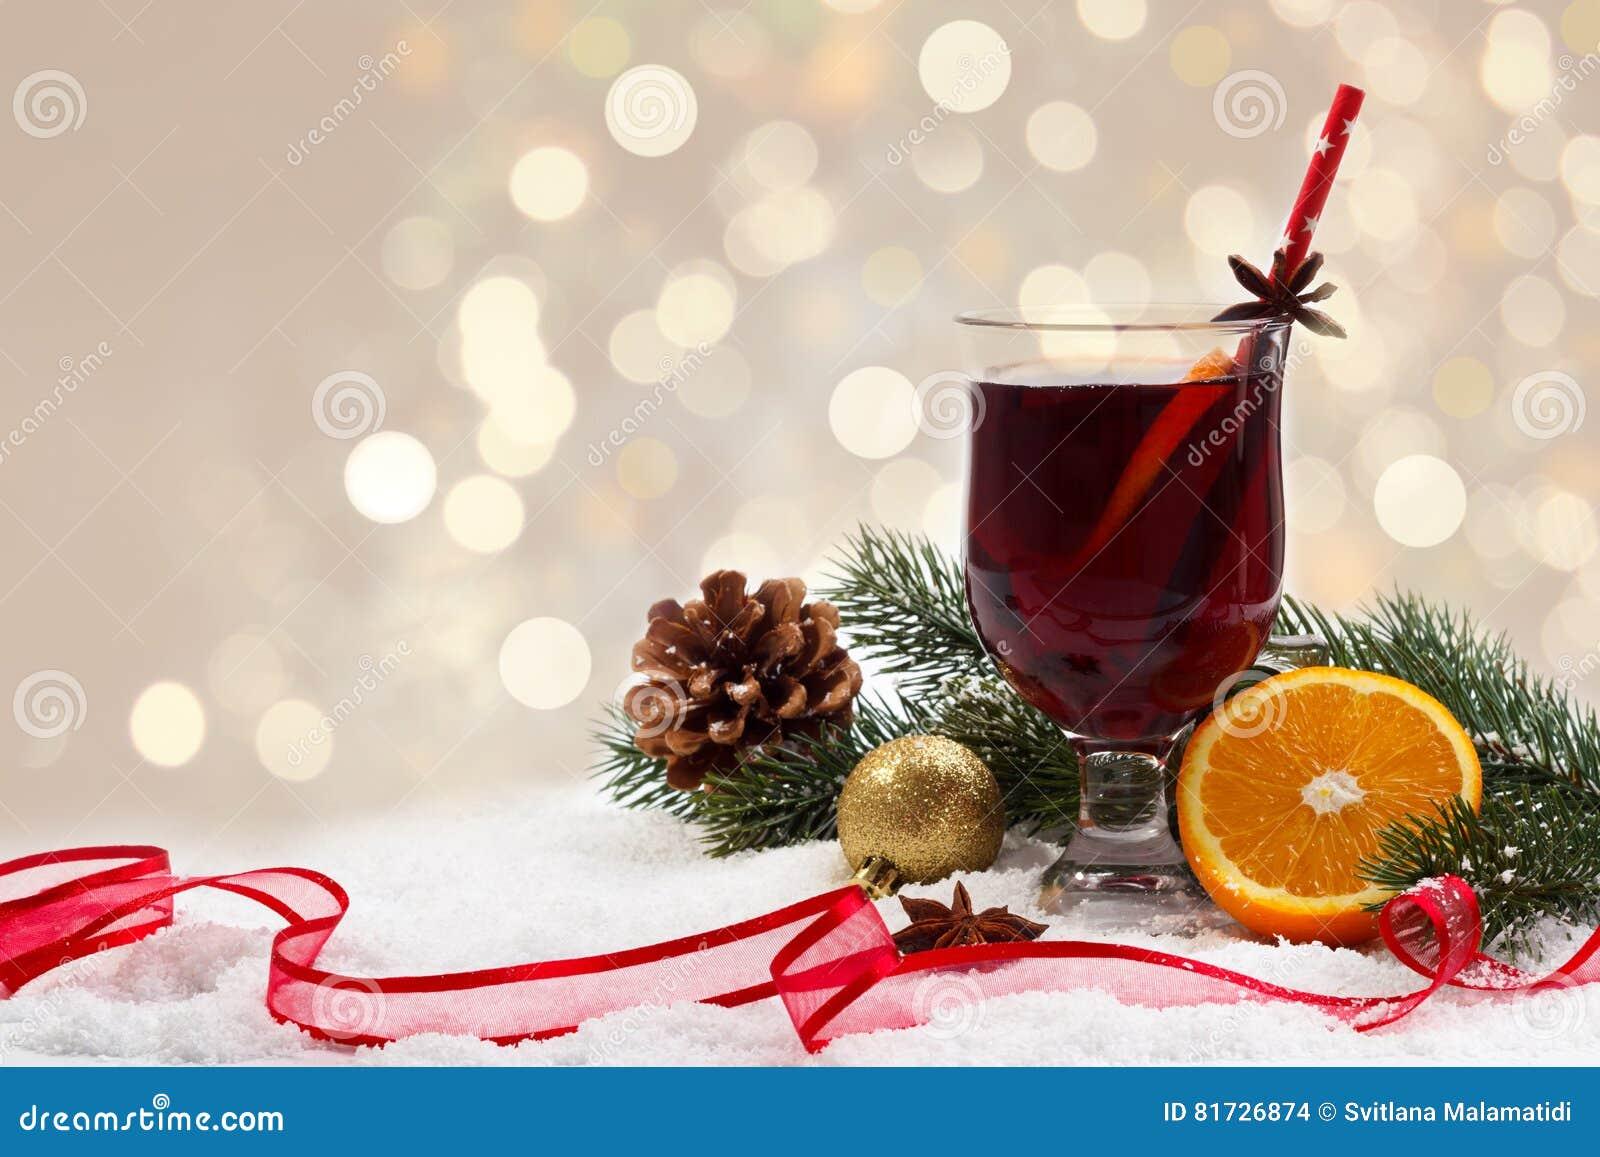 Christmas mulled wine stock photo. Image of advent, market - 81726874